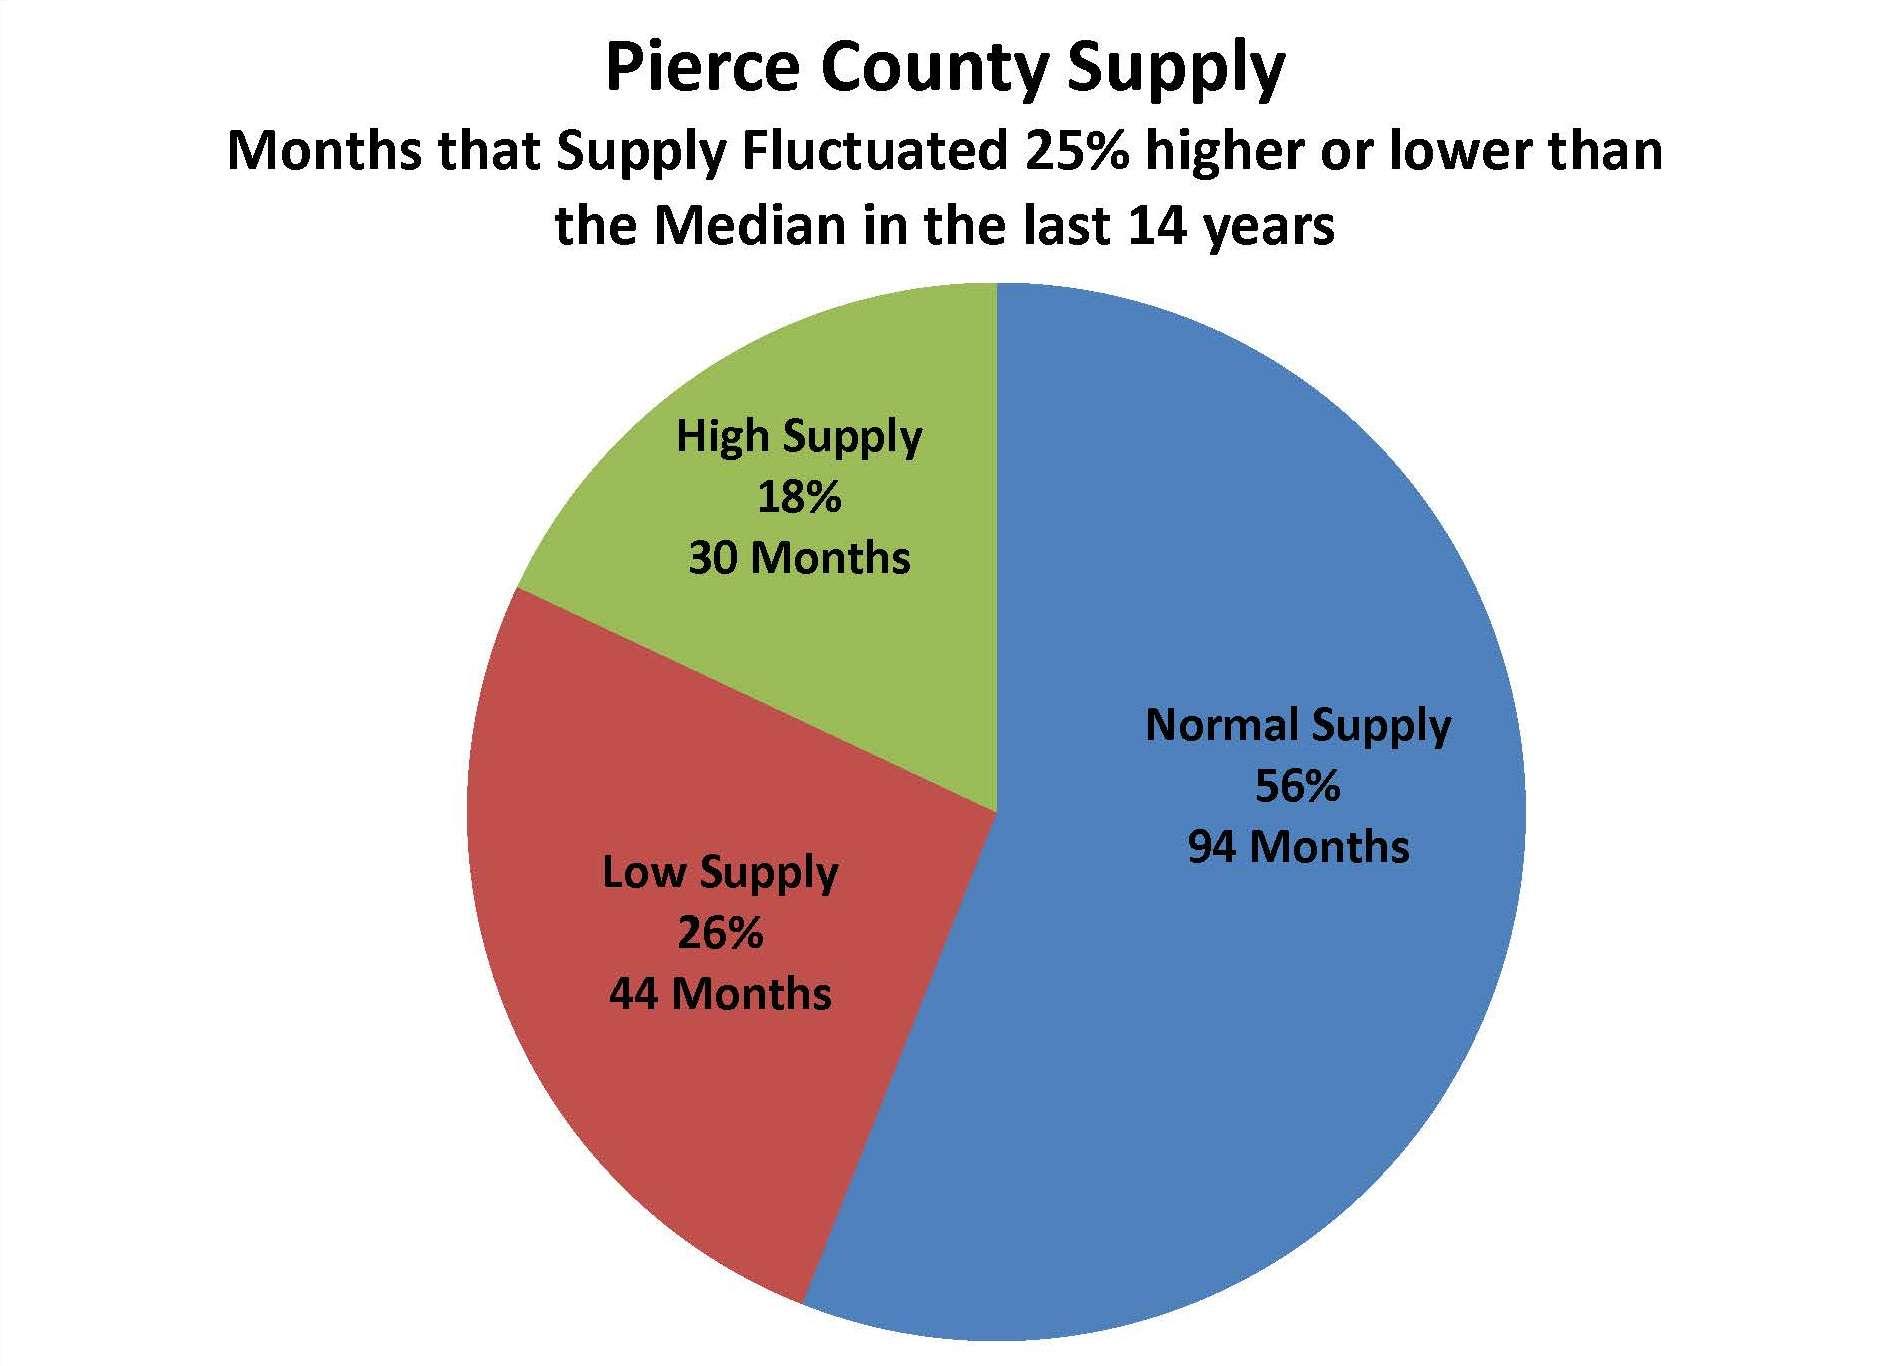 PC Supply Pie Chart